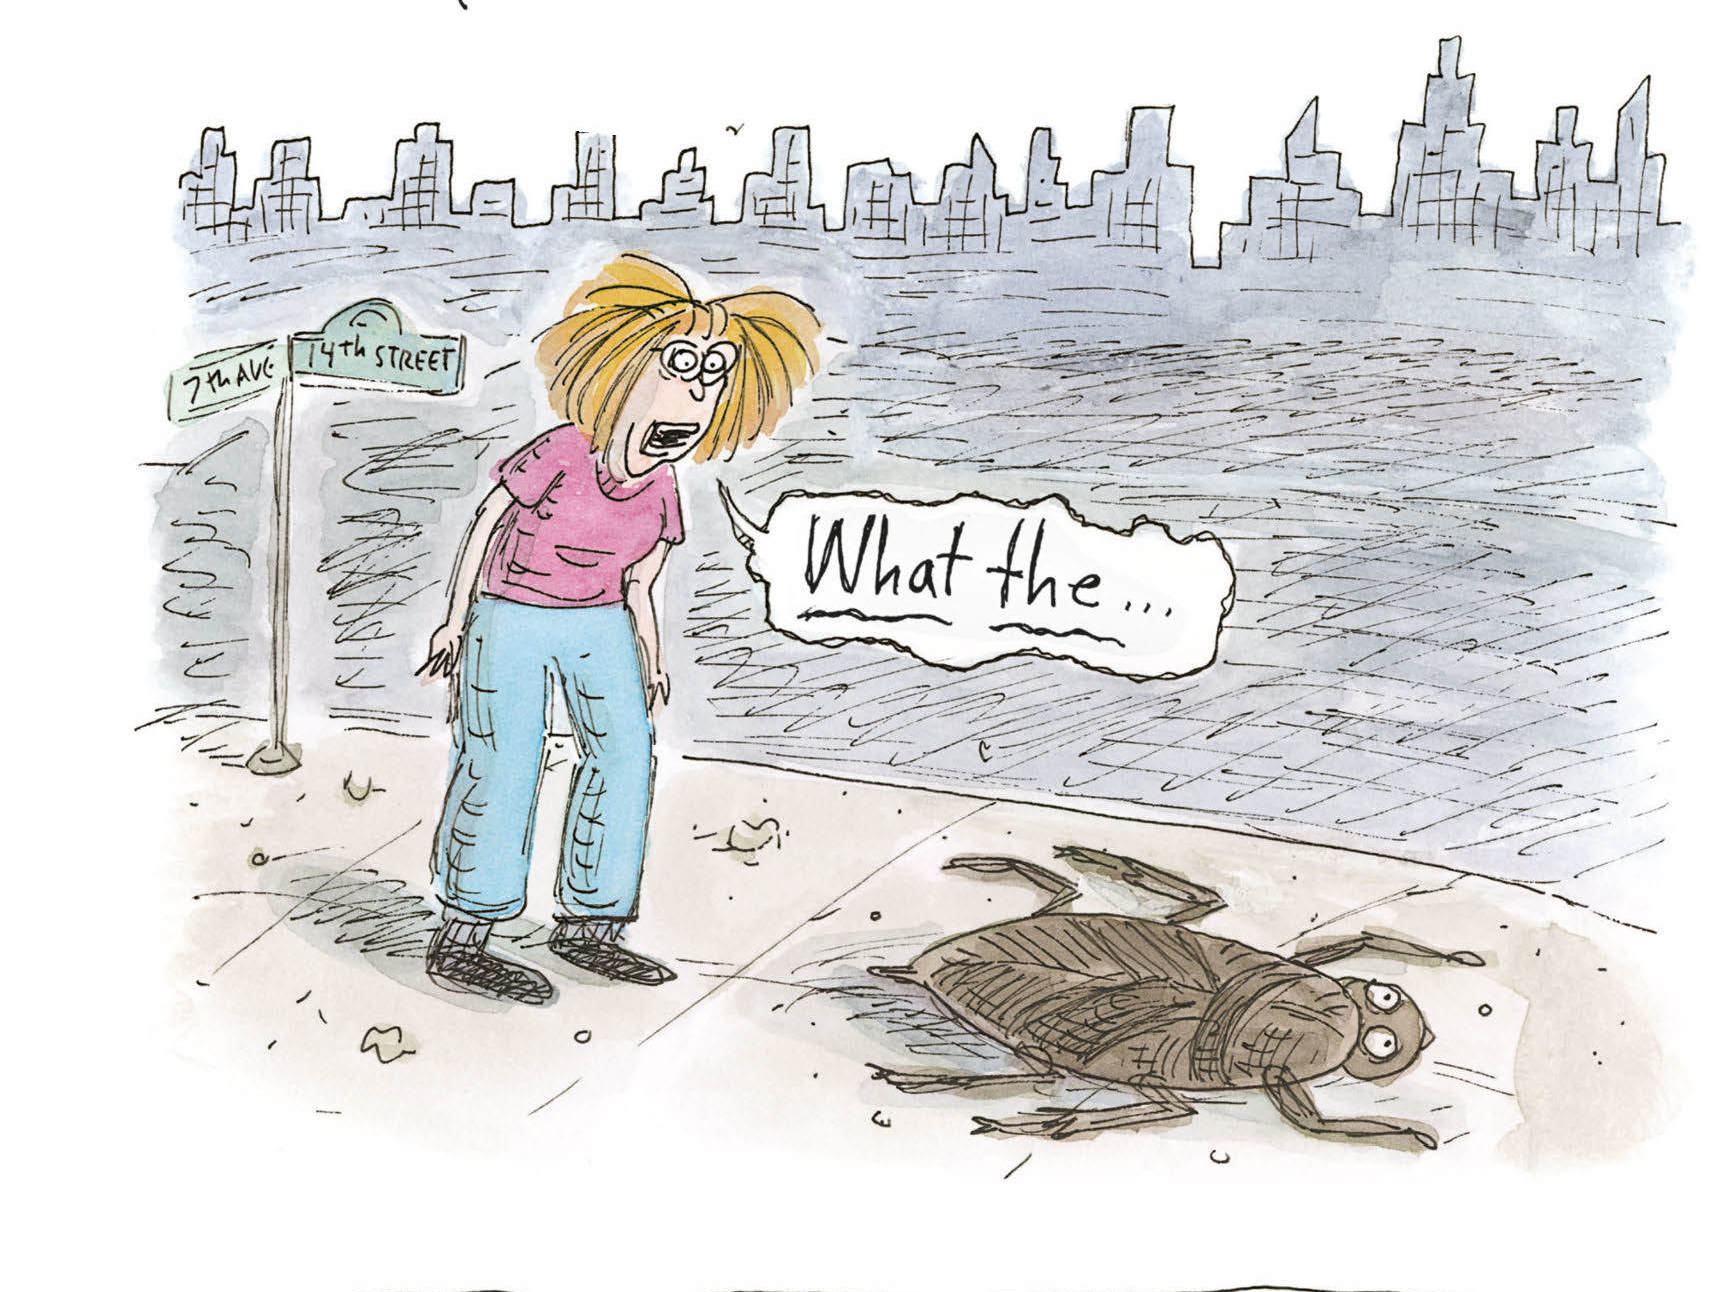 New York City waterbug